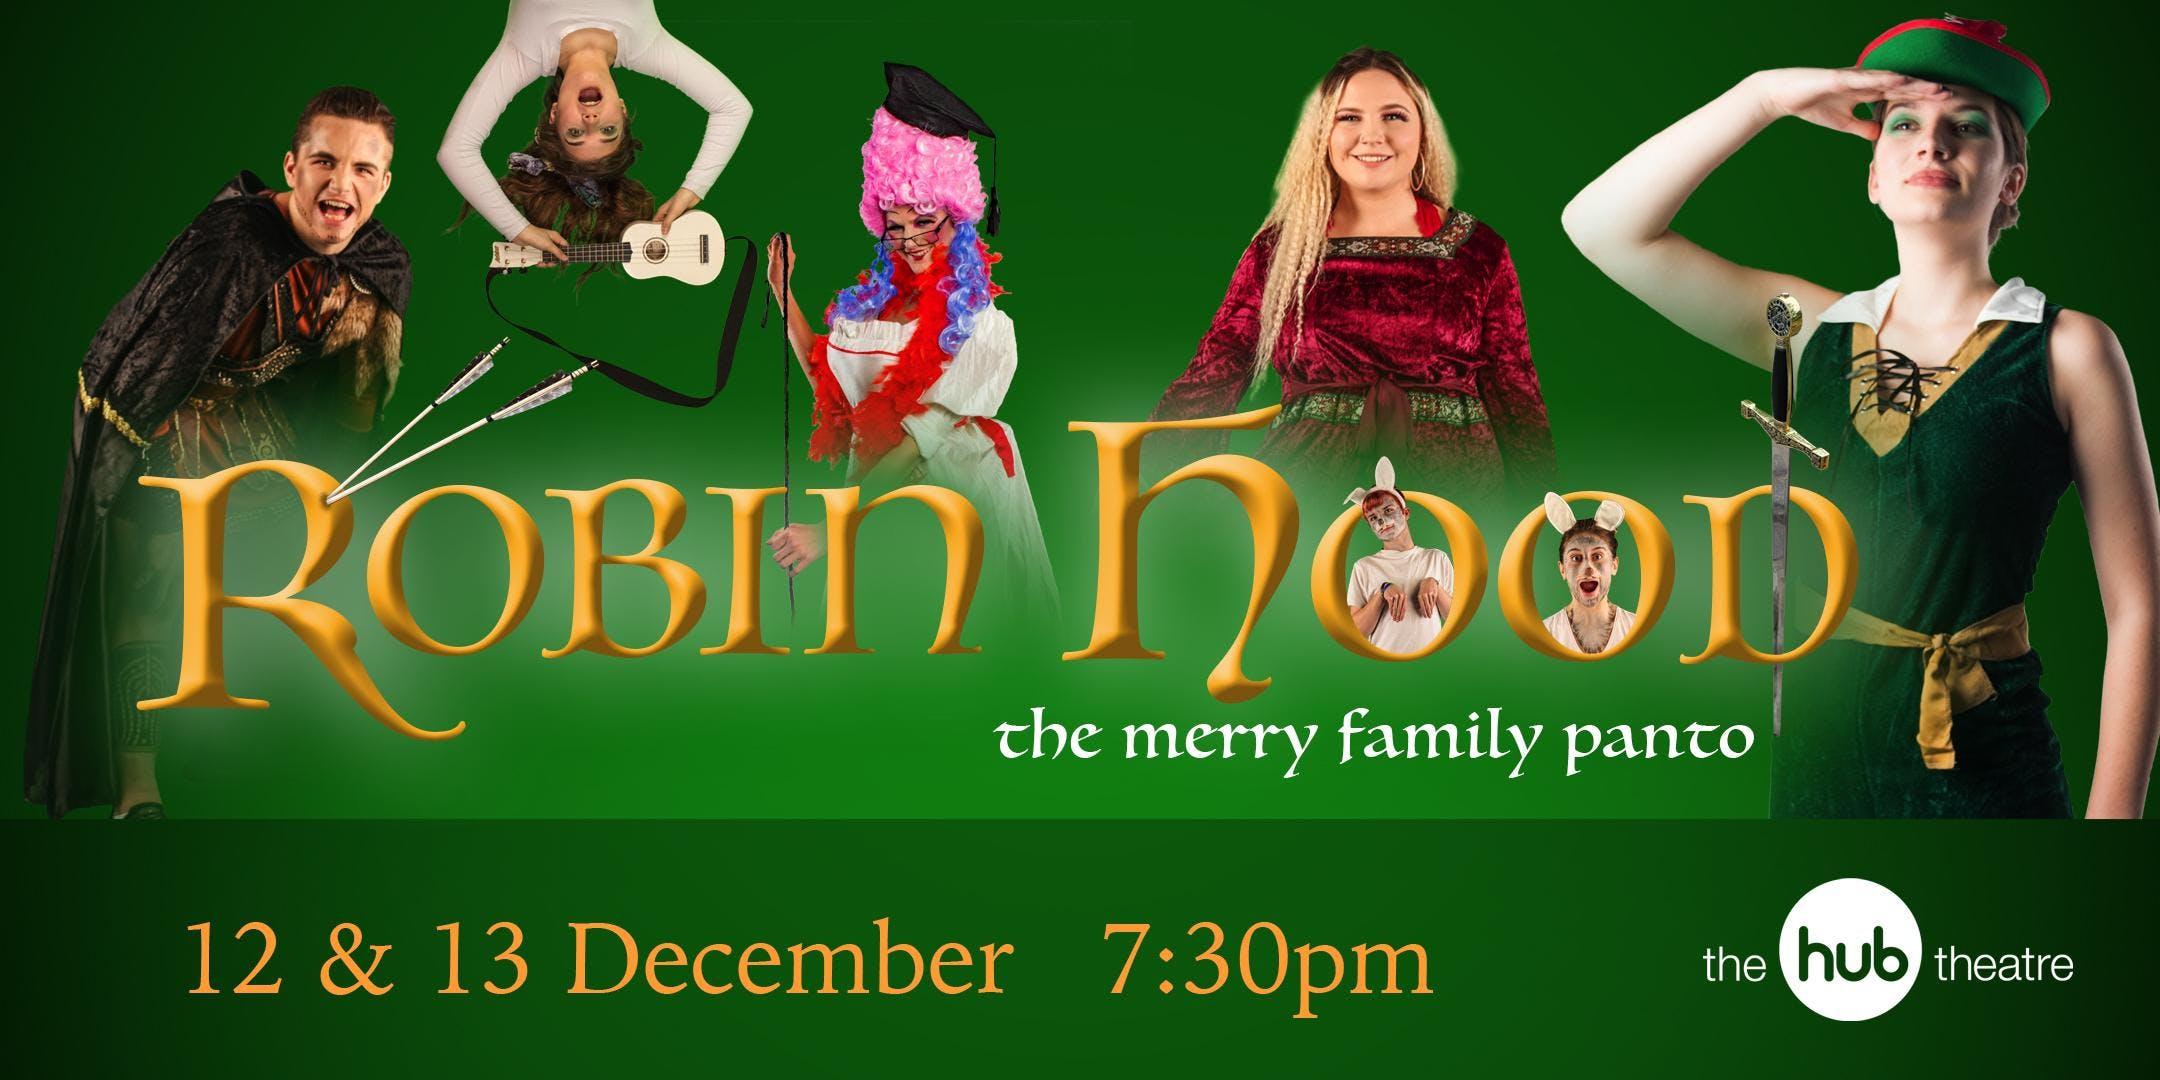 Robin Hood - the merry family panto